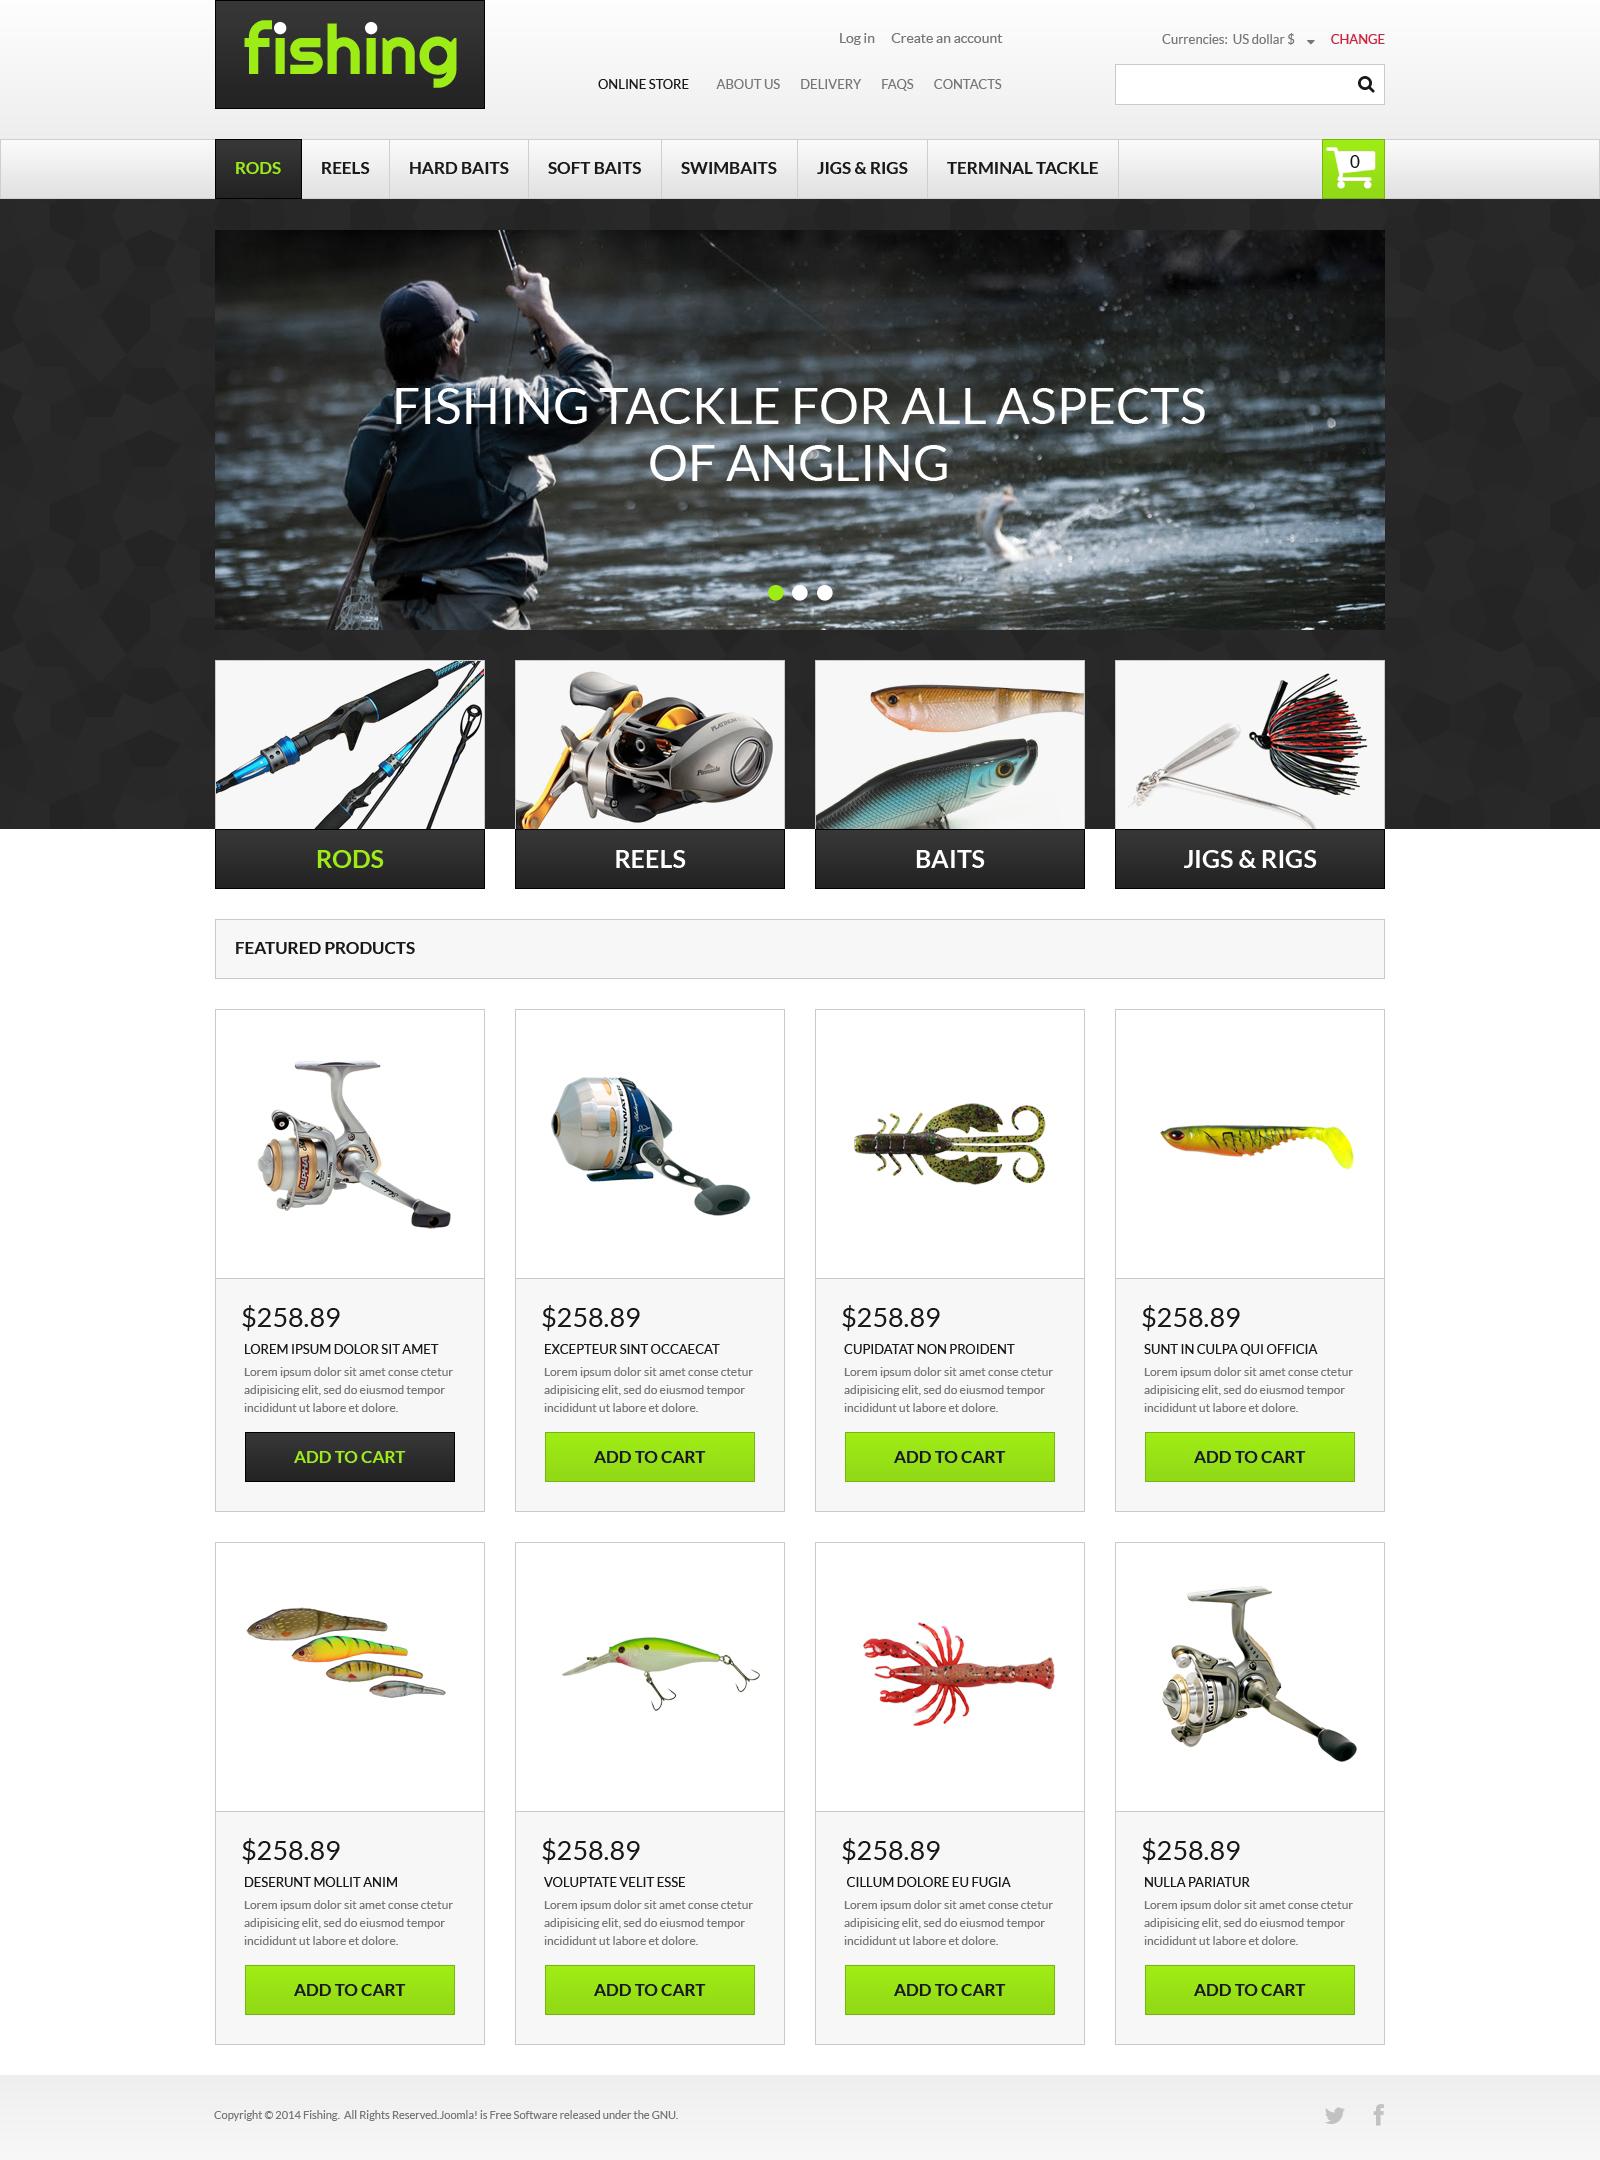 Varity of Fishing Equipment Virtuemart #49441 - Ekran resmi